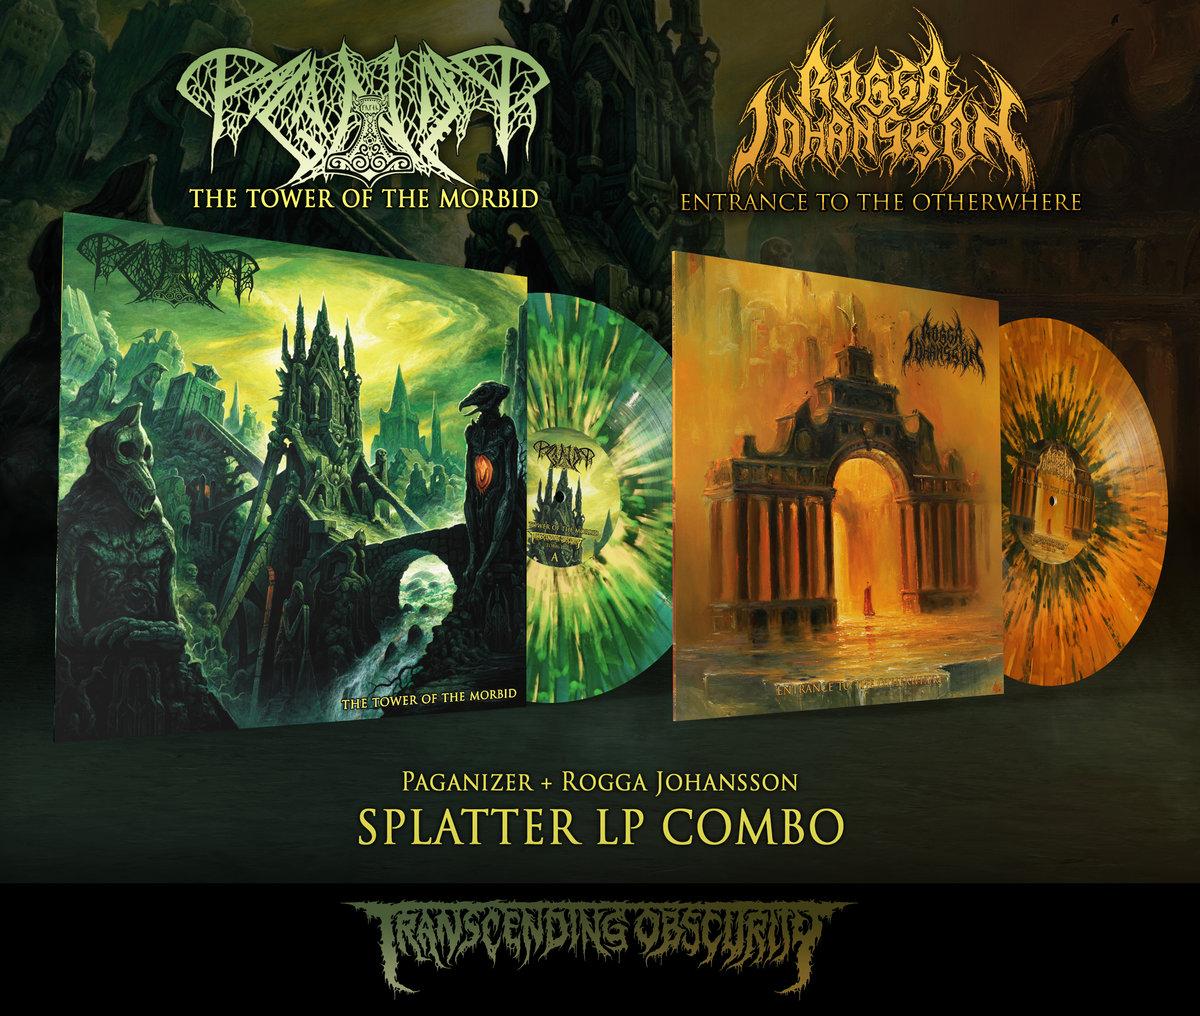 PAGANIZER + ROGGA JOHANSSON Splatter LP Combo (Limited to 20)